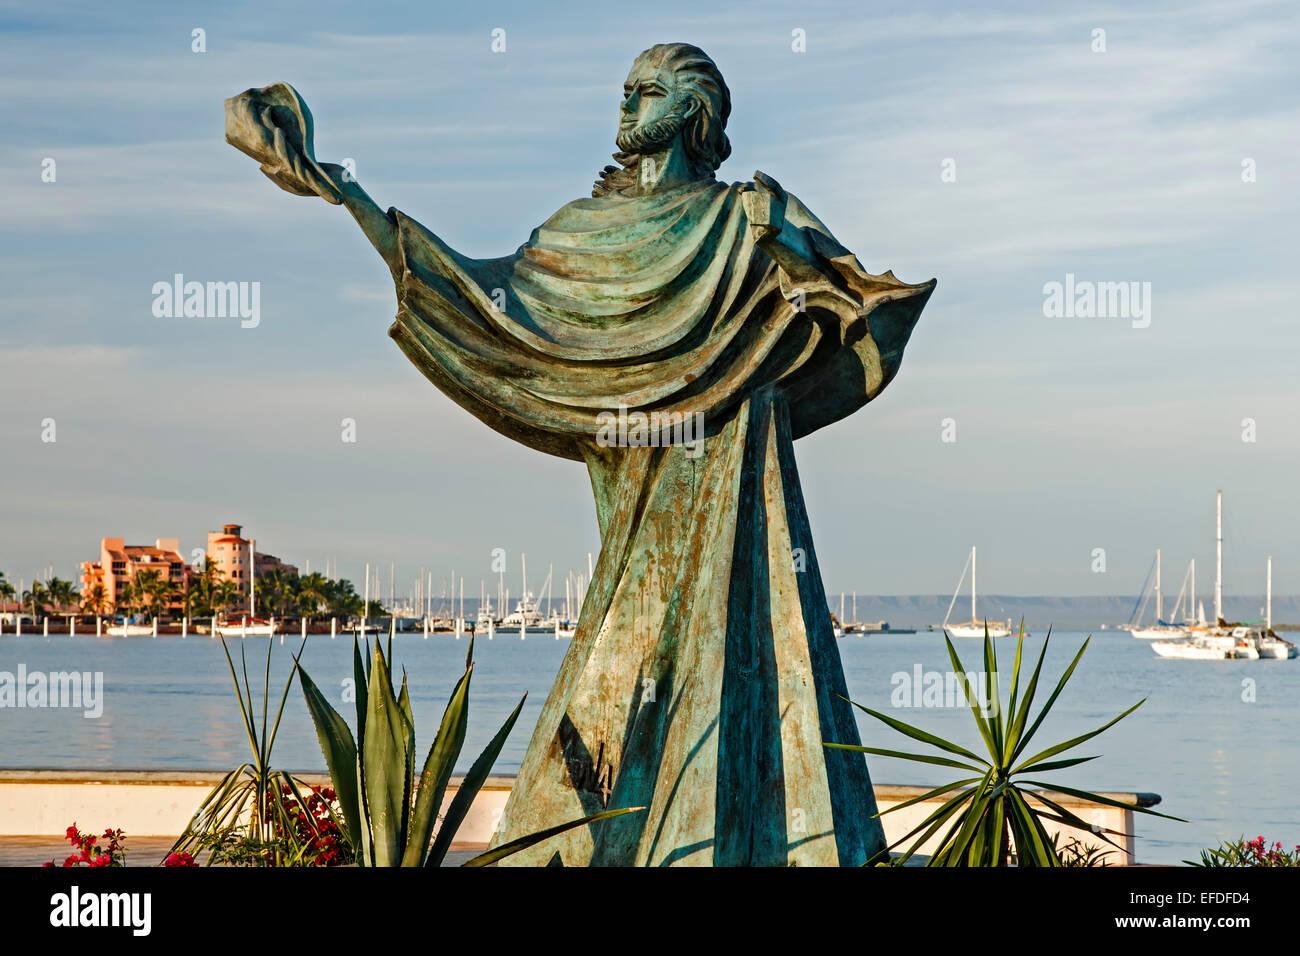 Sculpture of person holding a shell and bay,  Malecon (seaside promenade), La Paz, Baja California Sur, Mexico - Stock Image